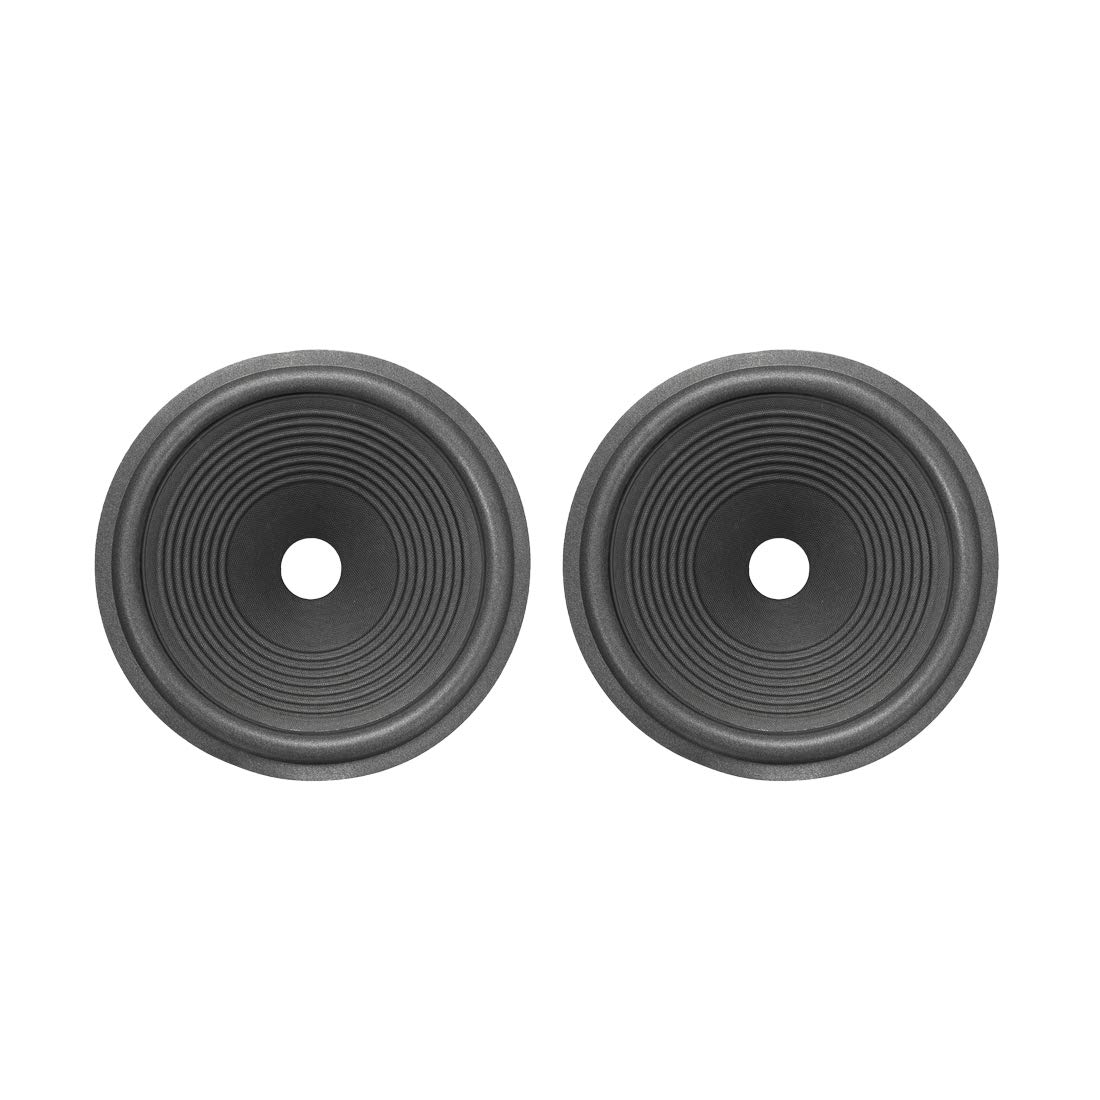 uxcell 10'' Paper Speaker Cone Subwoofer Drum Ripple Paper 1.4'' Coil Diameter with Foam Surround Dark Grey 2 Pcs